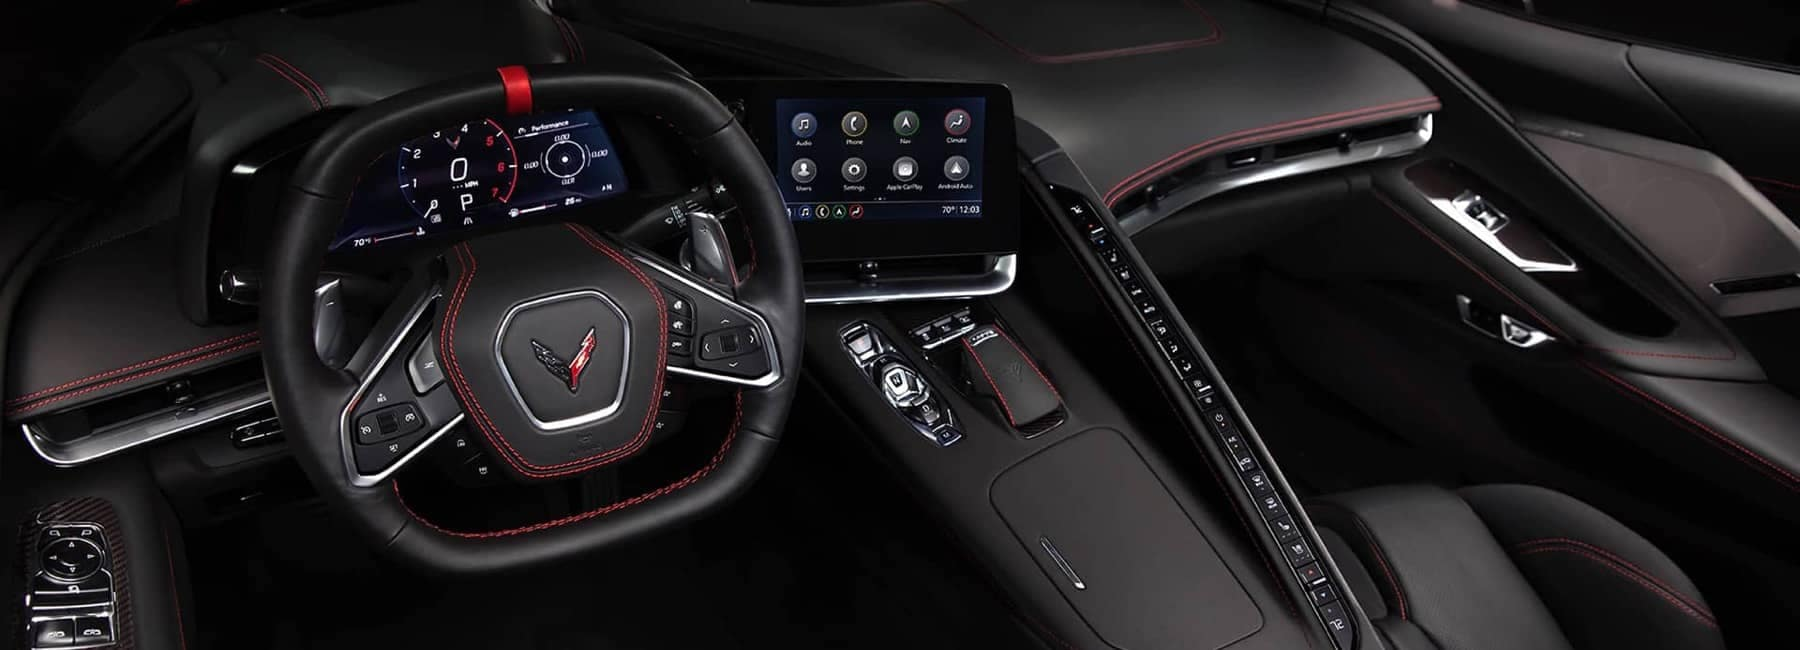 2020 Chevrolet Corvette Mid-Engine Sports Car front dashboard interior